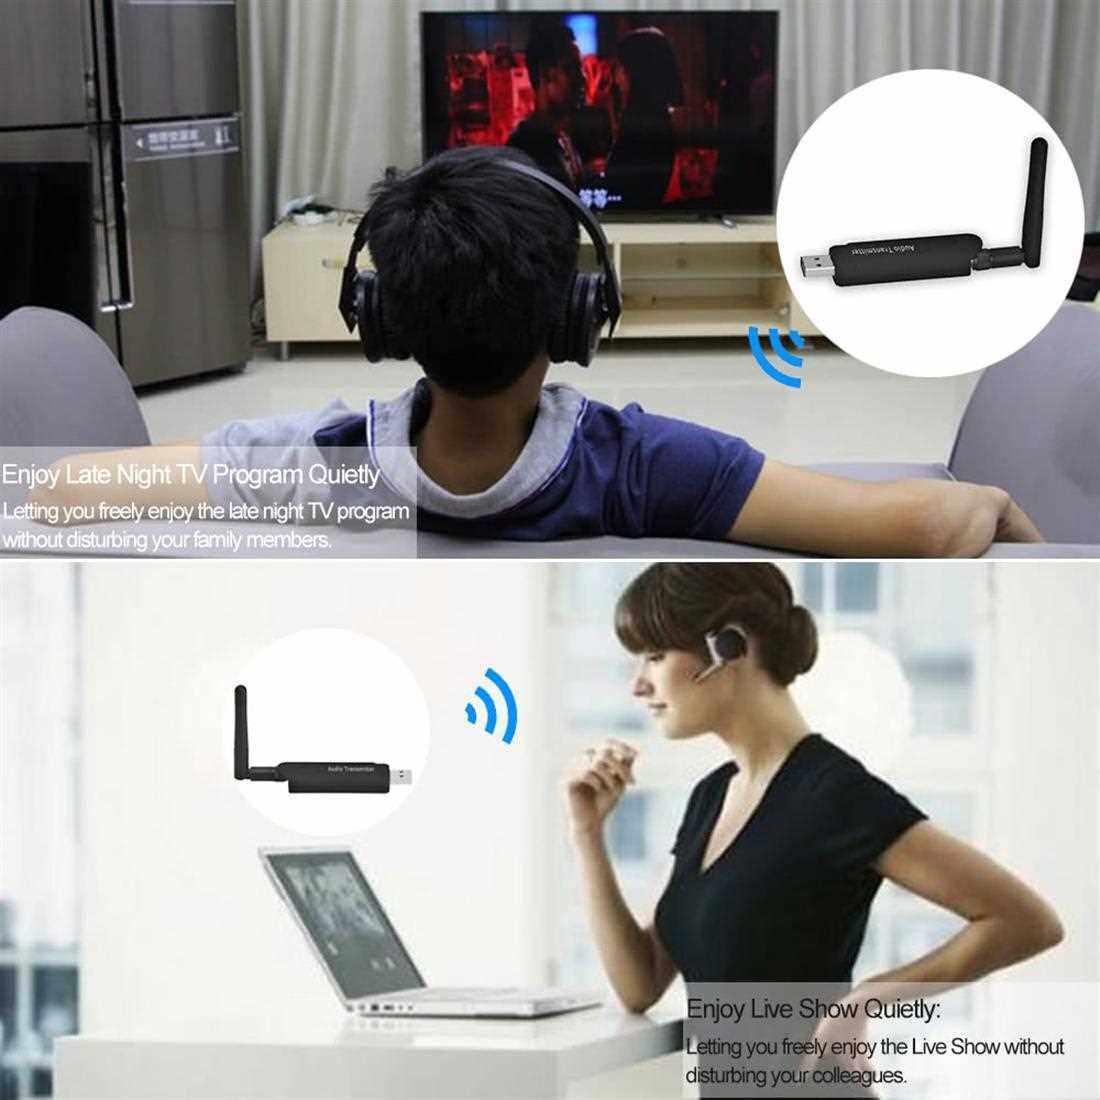 Best Selling B5 Bluetooth Transmitter Wireless Audio Transmitter Stereo Music Stream External Antenna Strong Signal for TV Notebook DVD PC CD Player (Black)